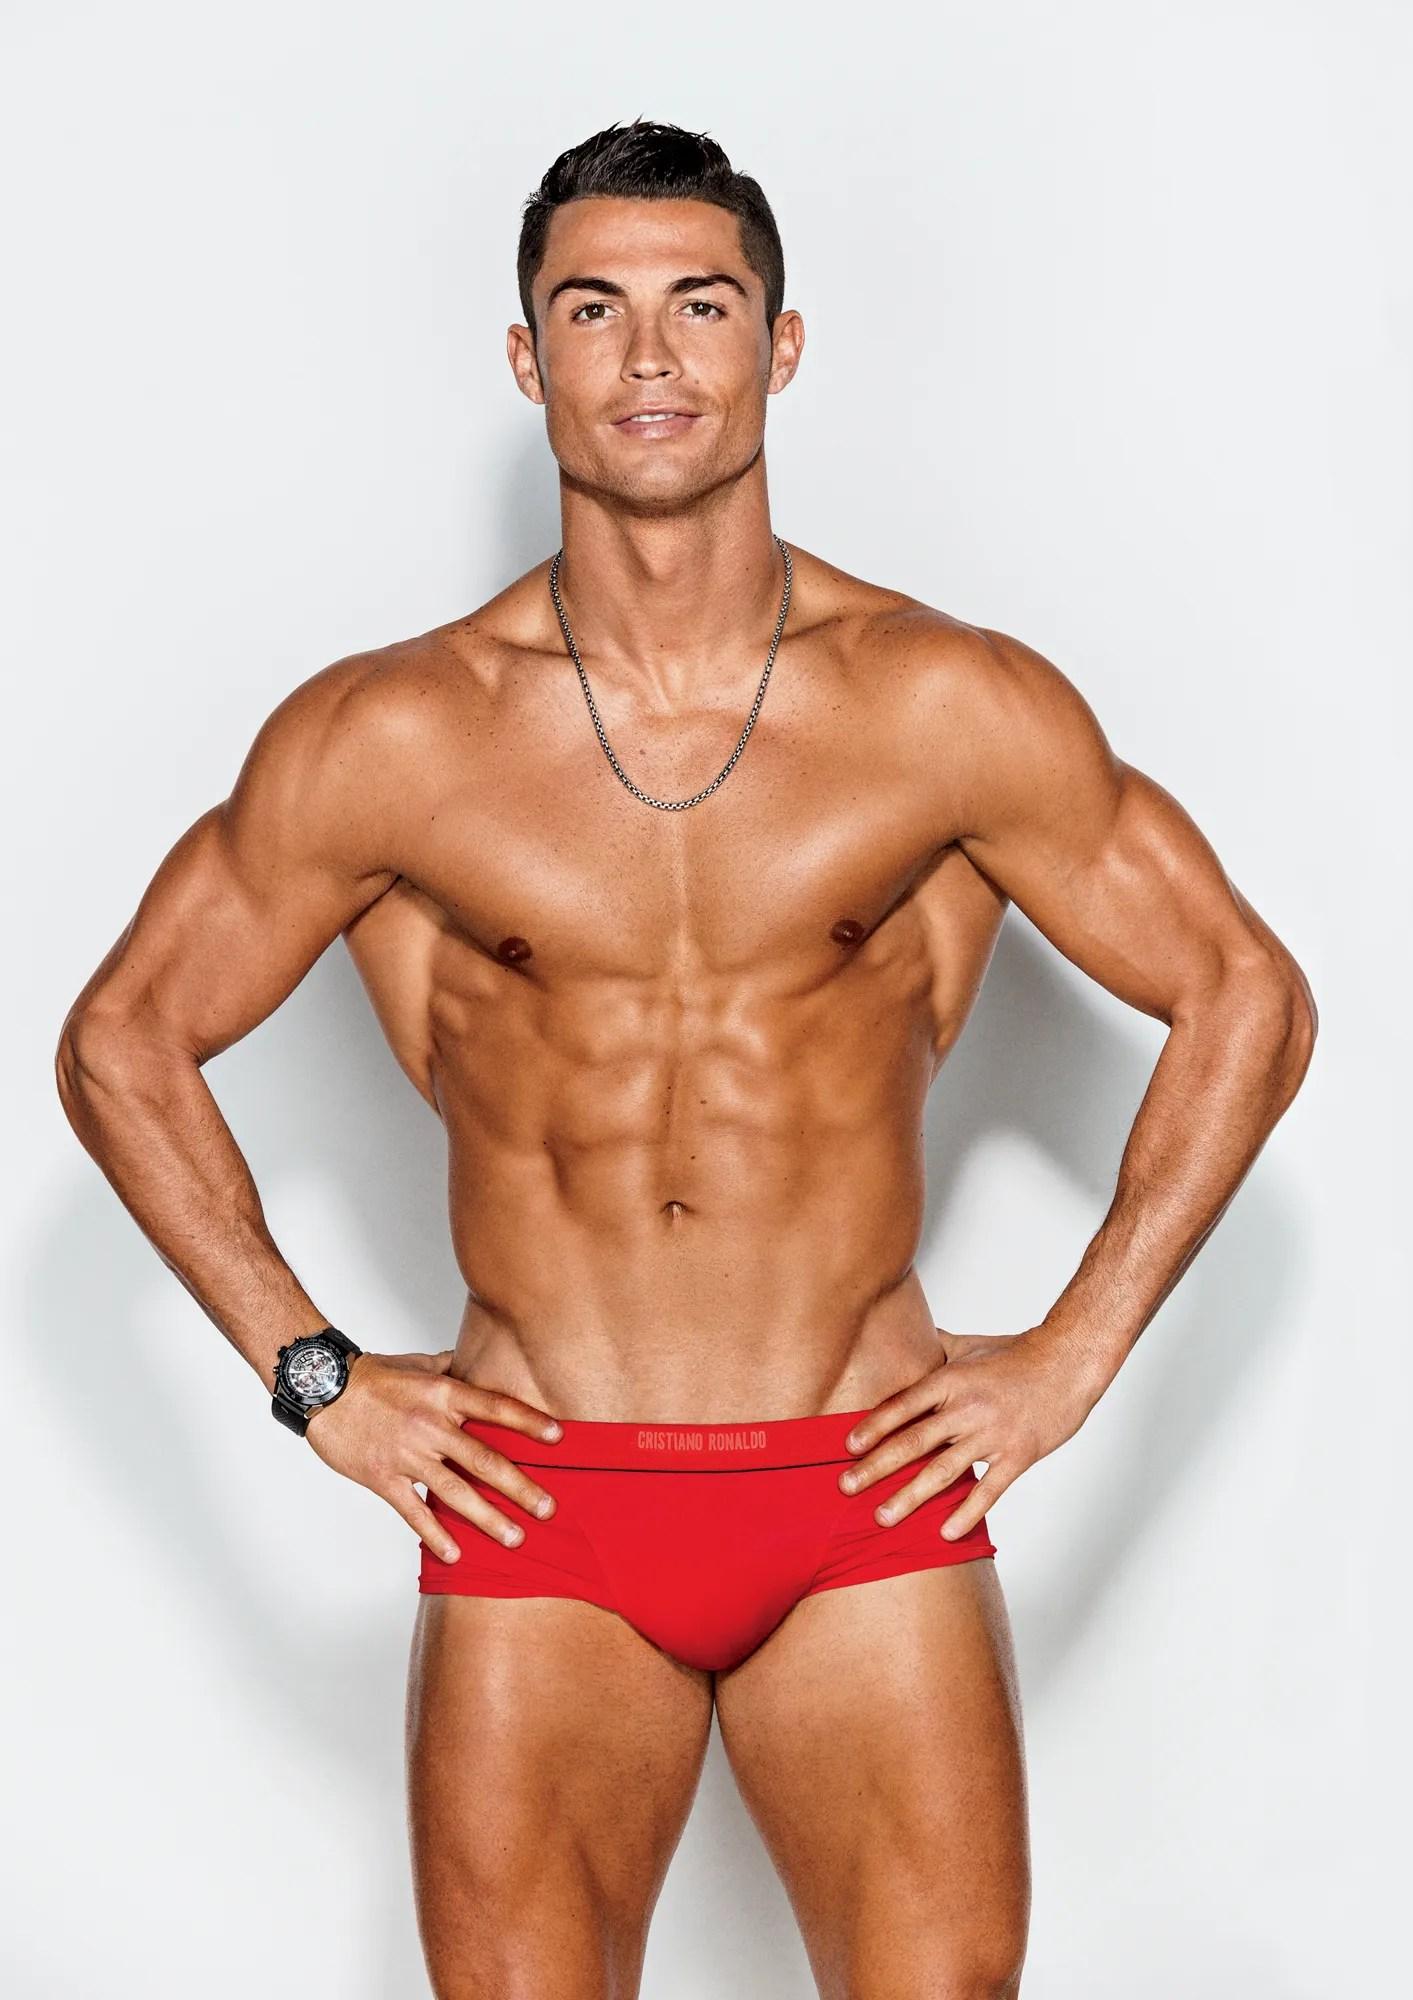 Ronaldo Muscle : ronaldo, muscle, Amazing, Ronaldo, Muscle,